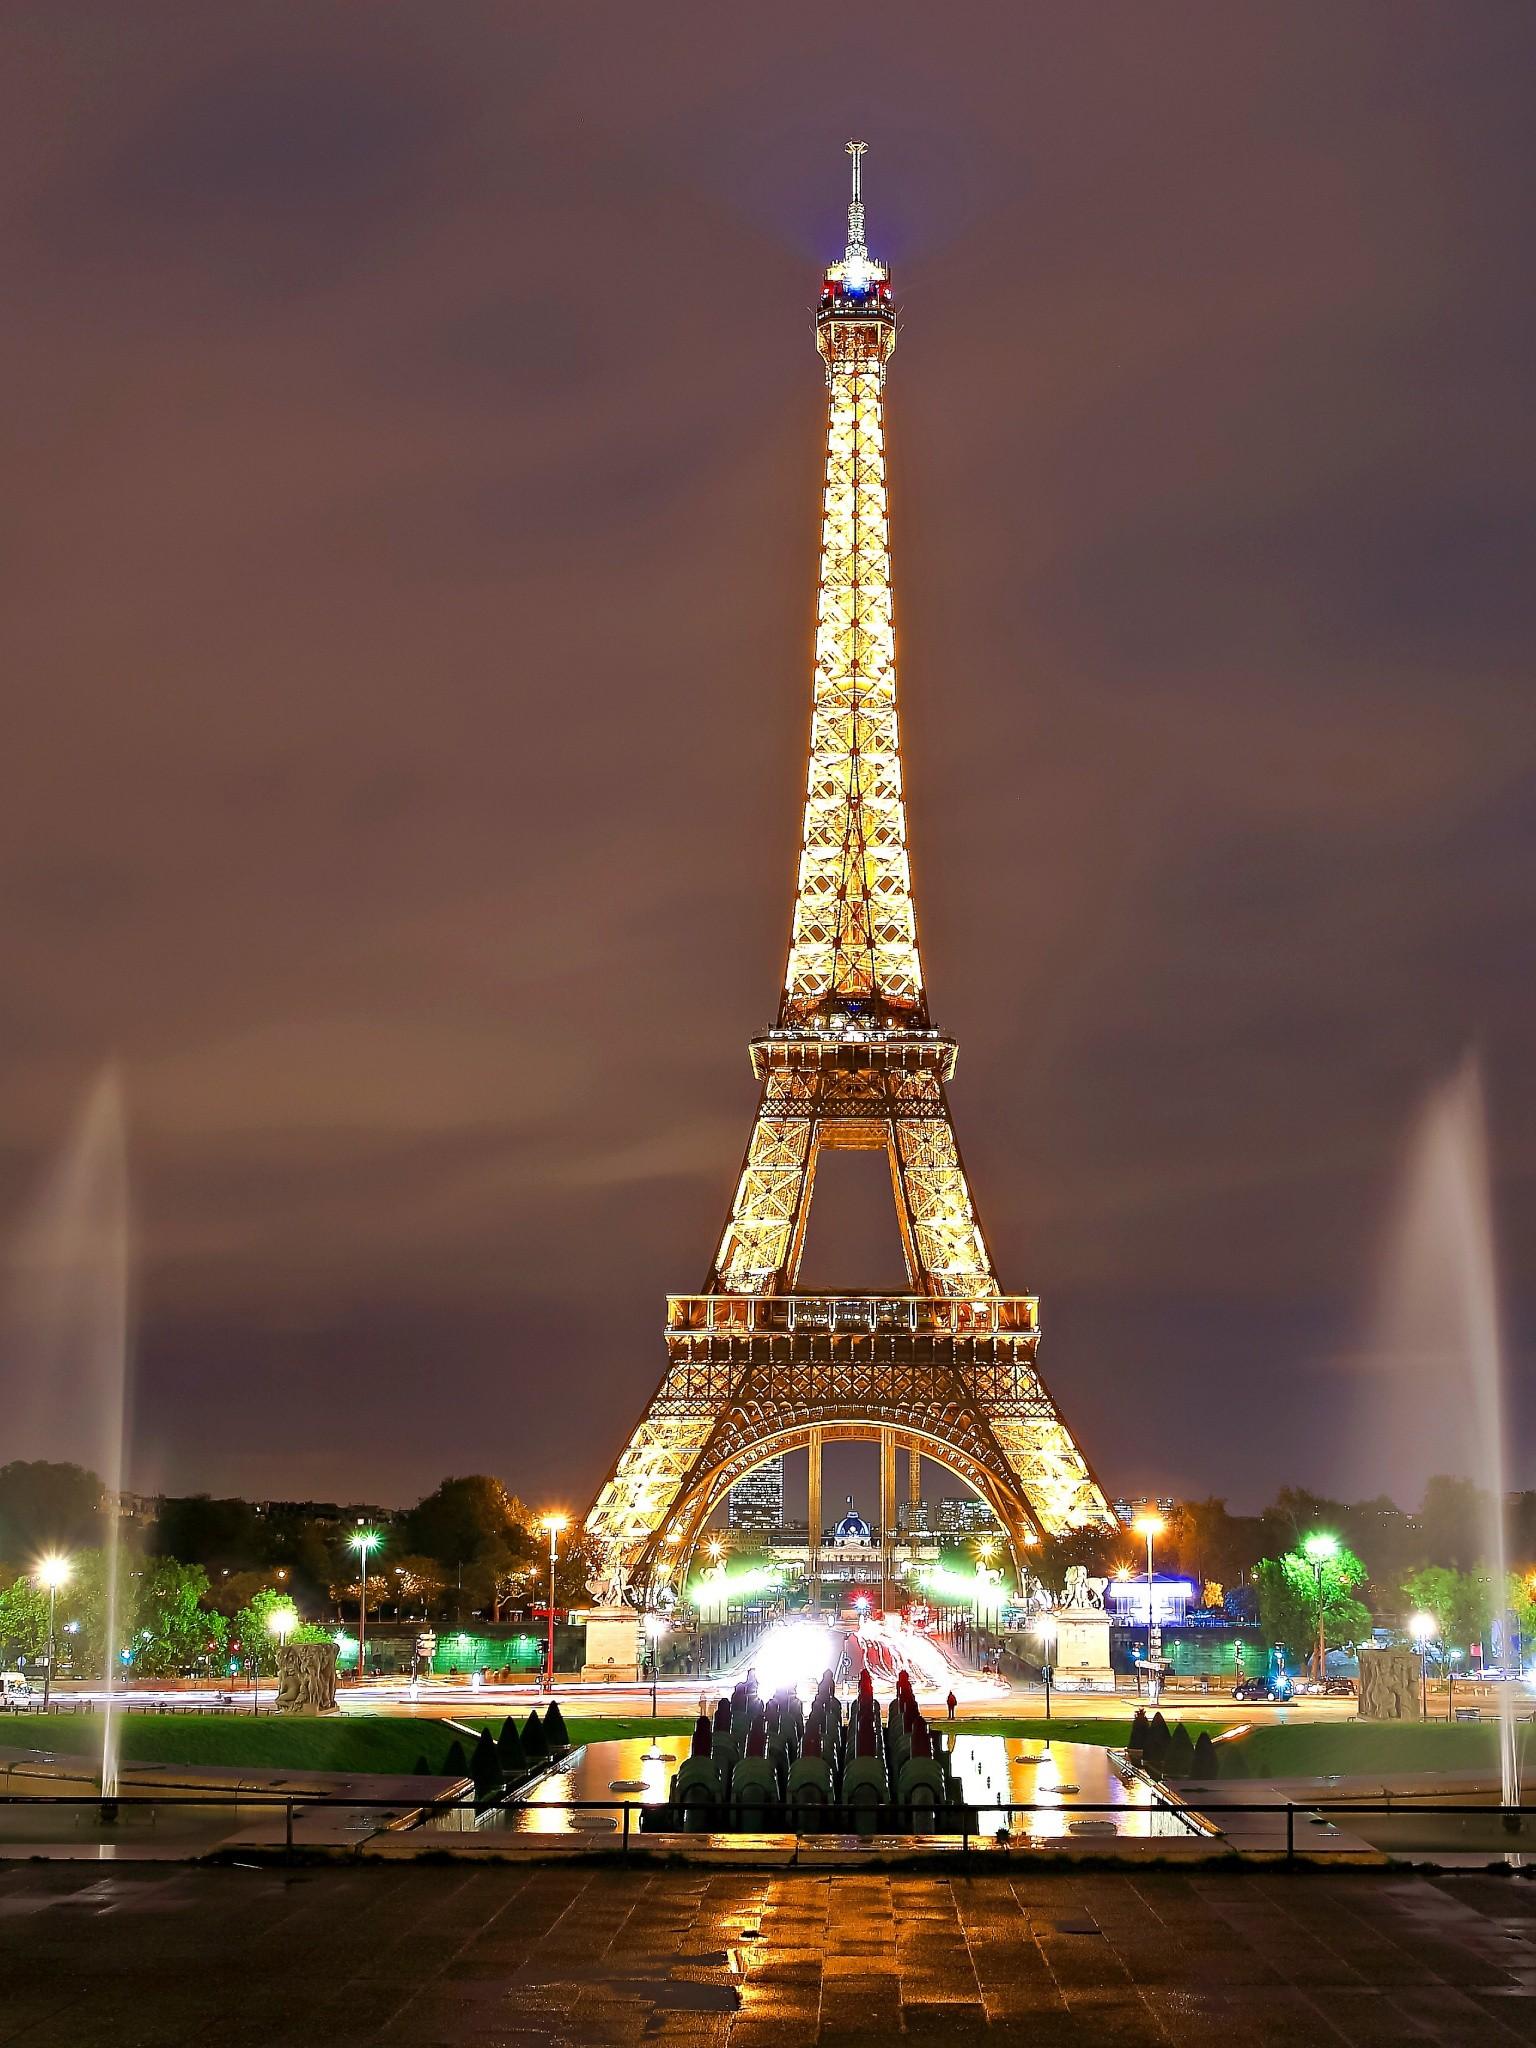 Must see Wallpaper Macbook Paris - Paris-Eiffel-Tower-Wallpaper-1536x2048  2018_15125.jpg